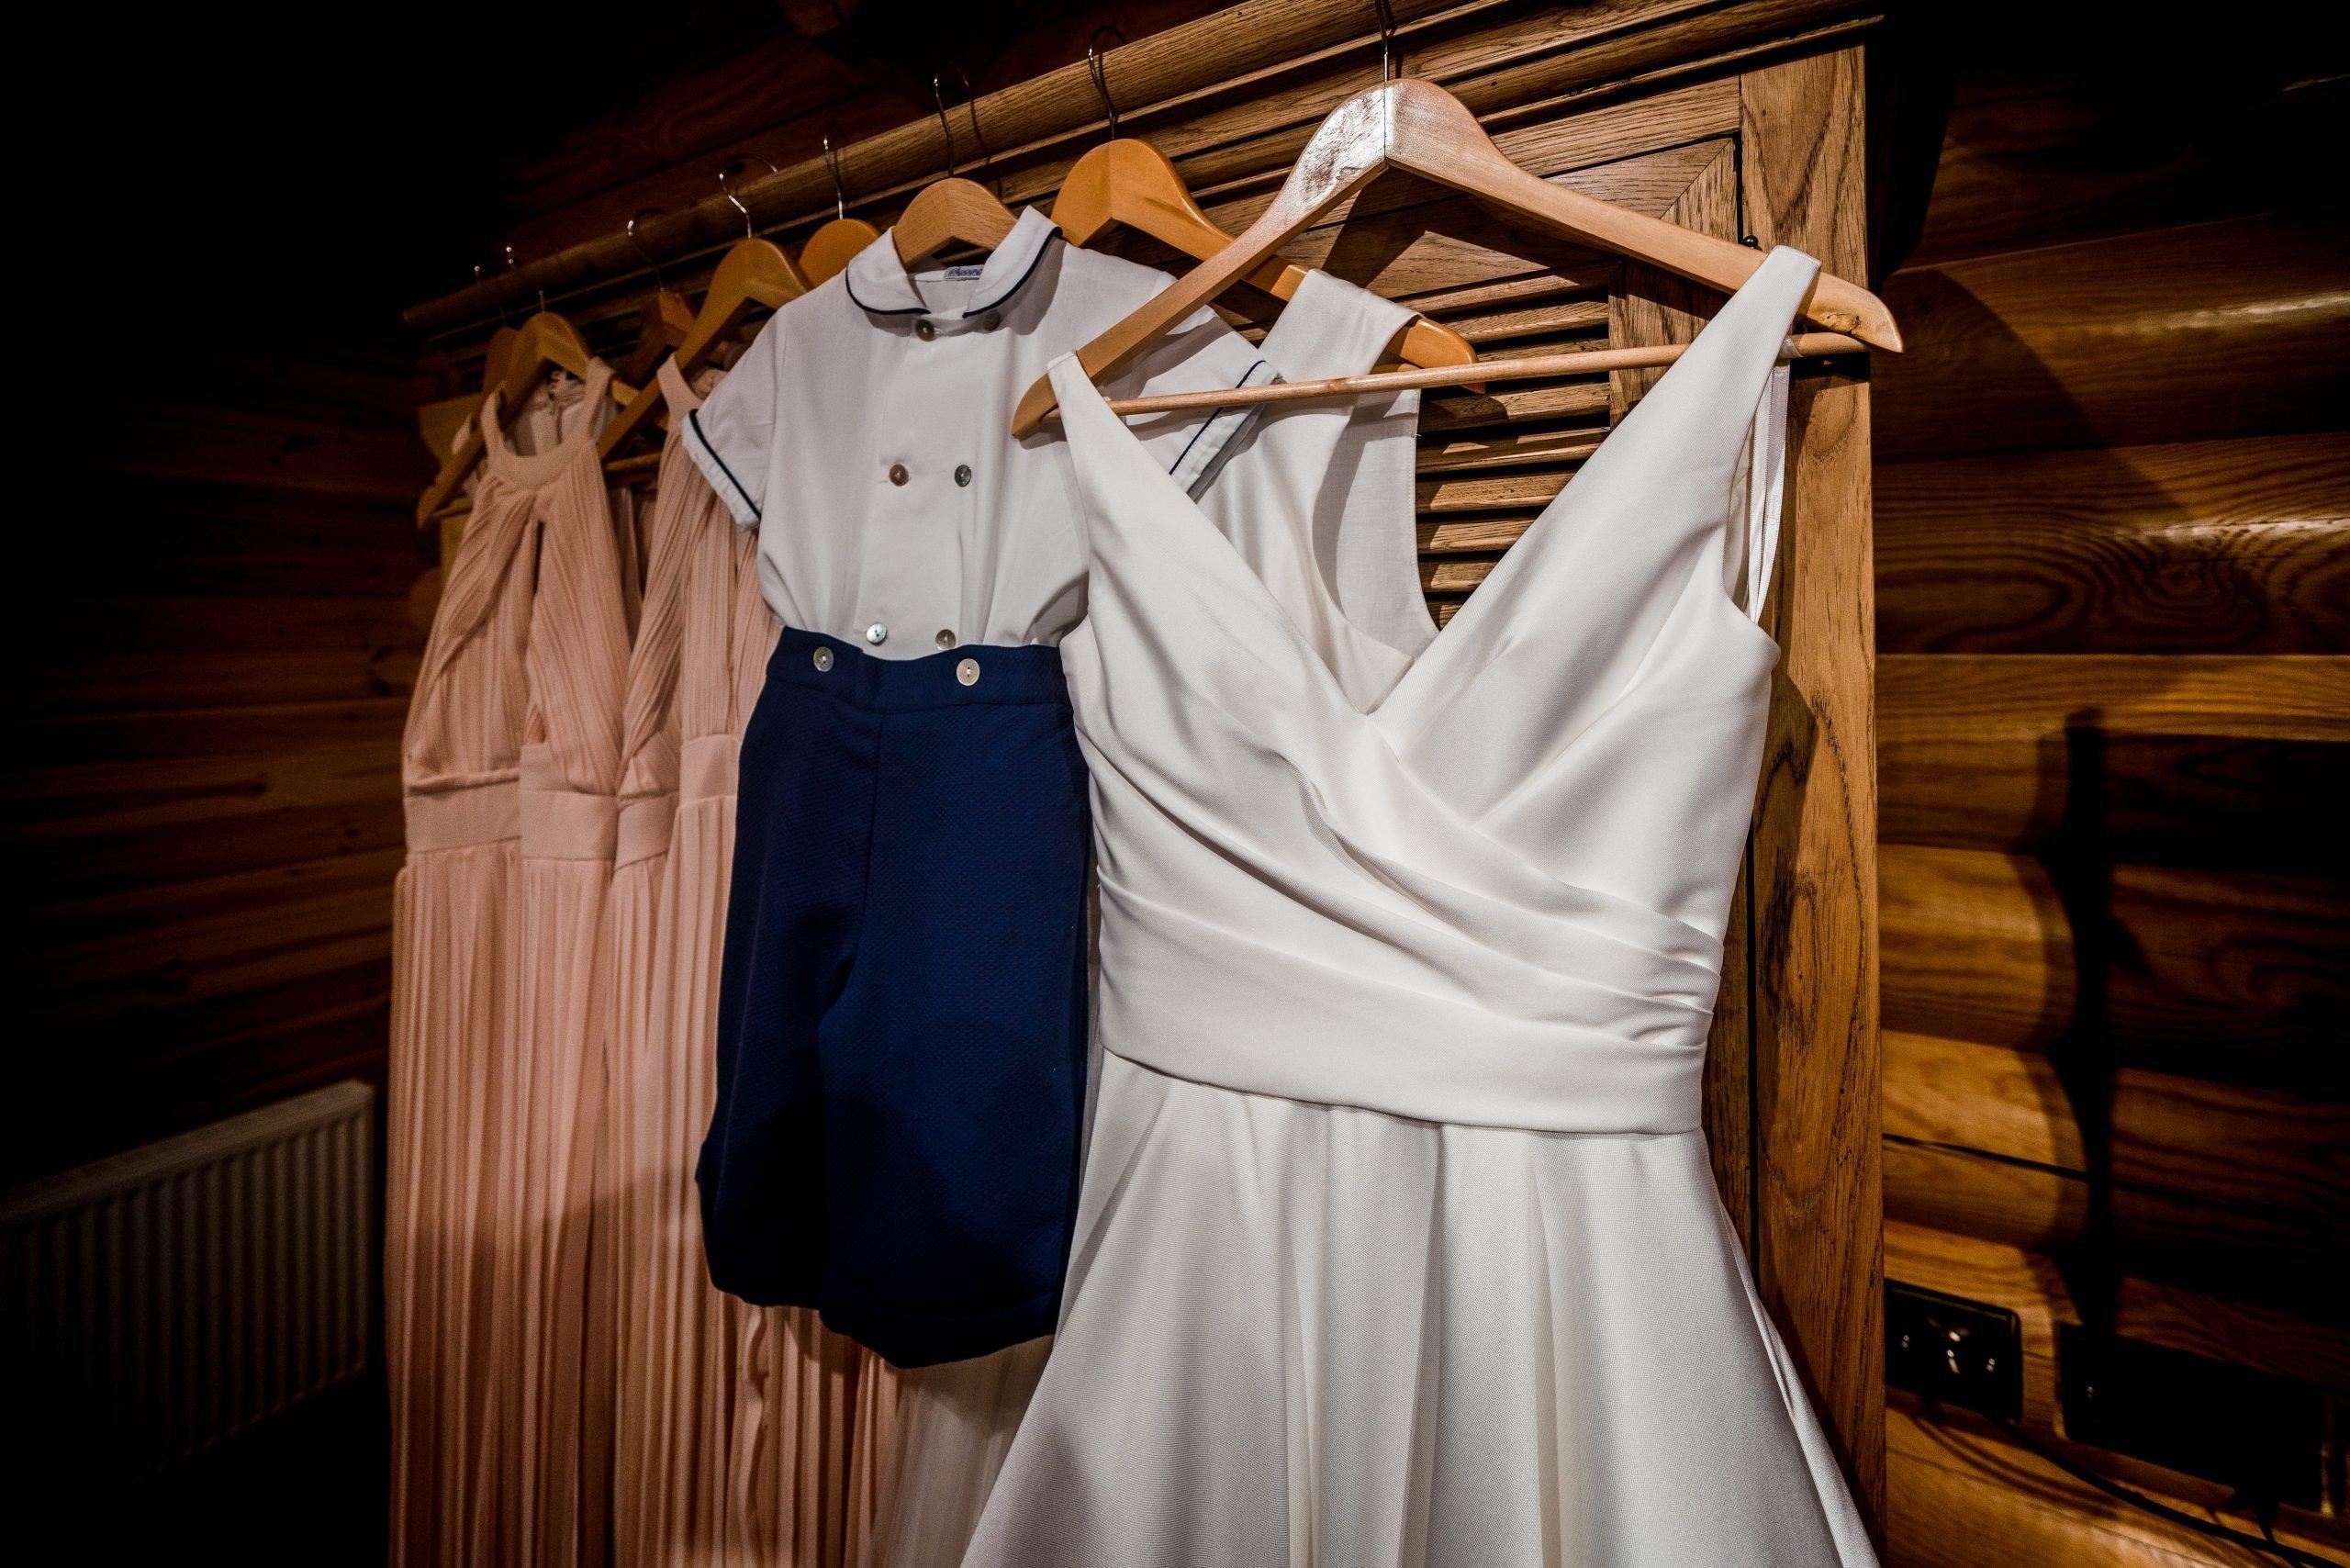 YFFUK Phil Endicott choosing your wedding dress Foxton Locks Lodges